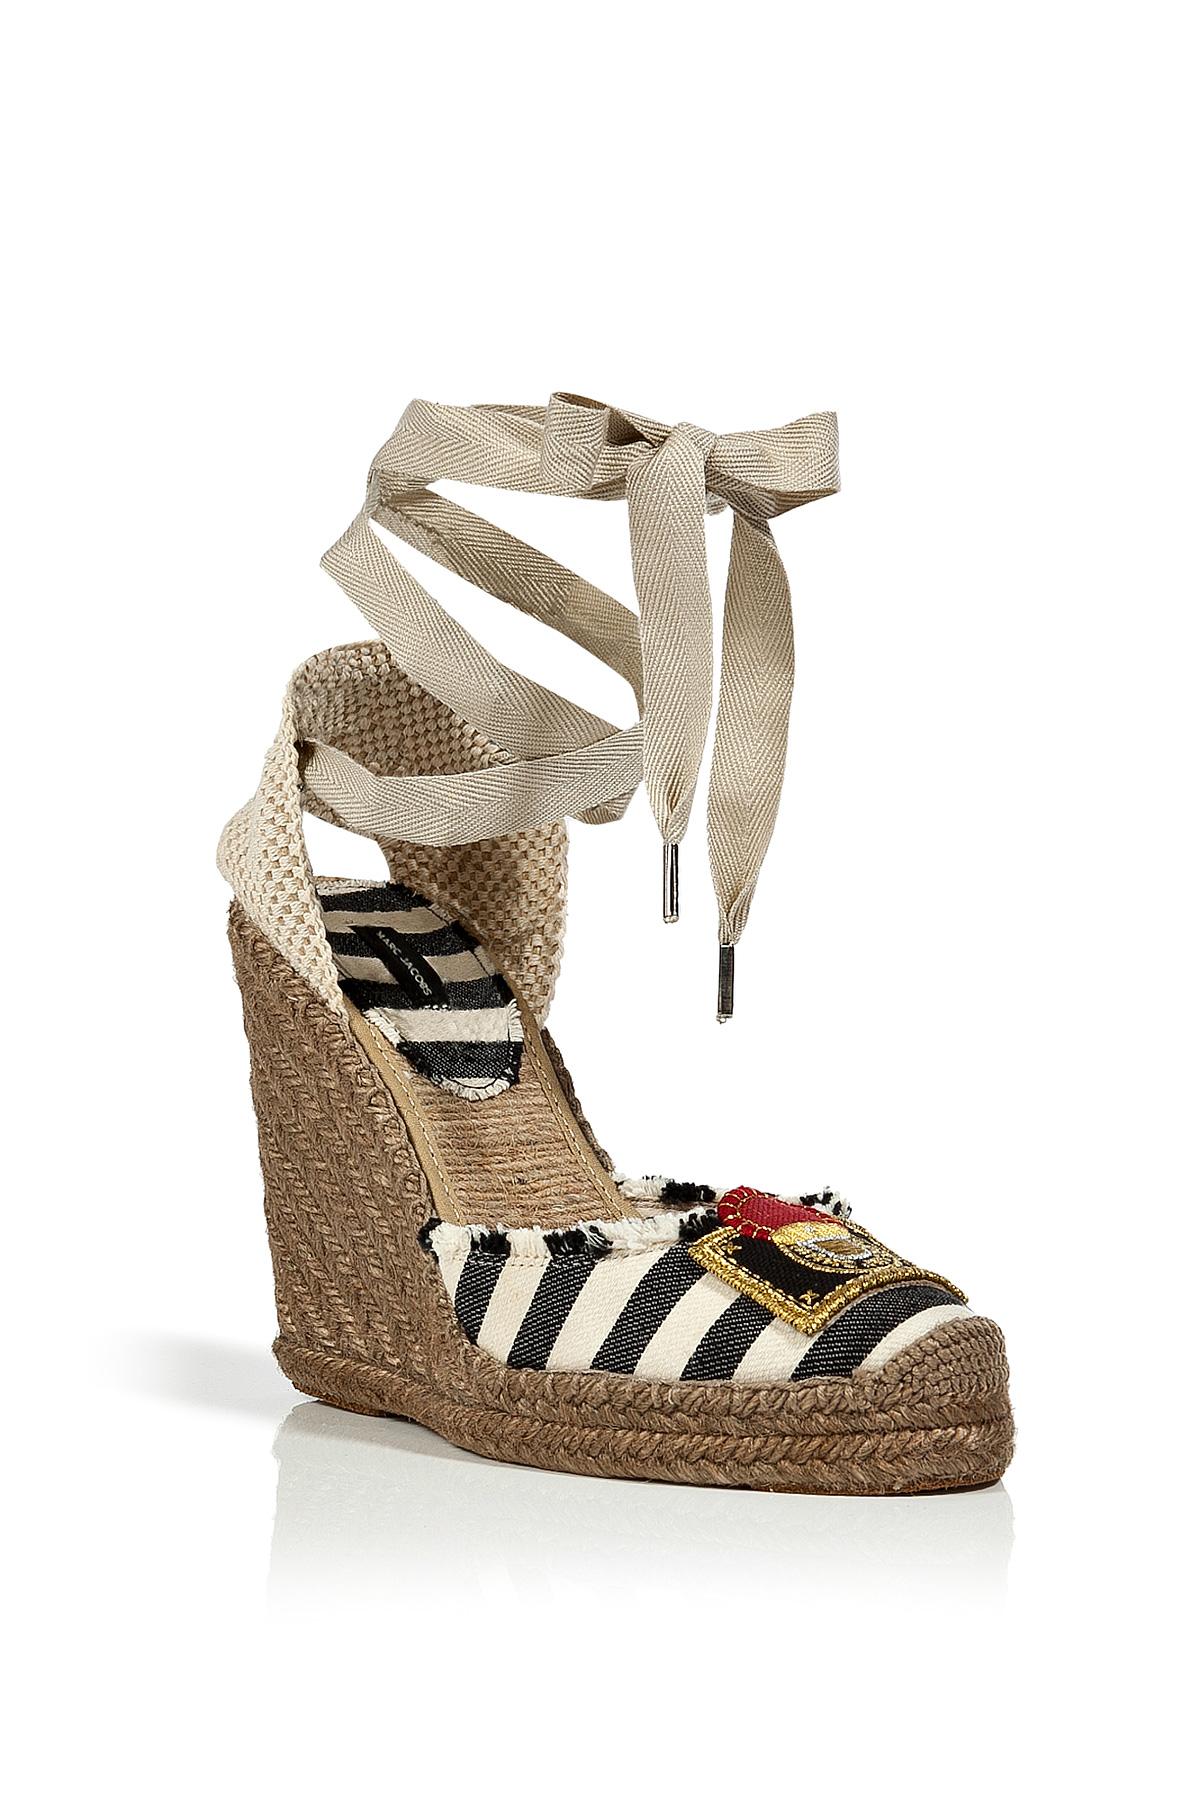 49ff96fbb3a Marc Jacobs White Black/cream Striped Espadrille Wedges